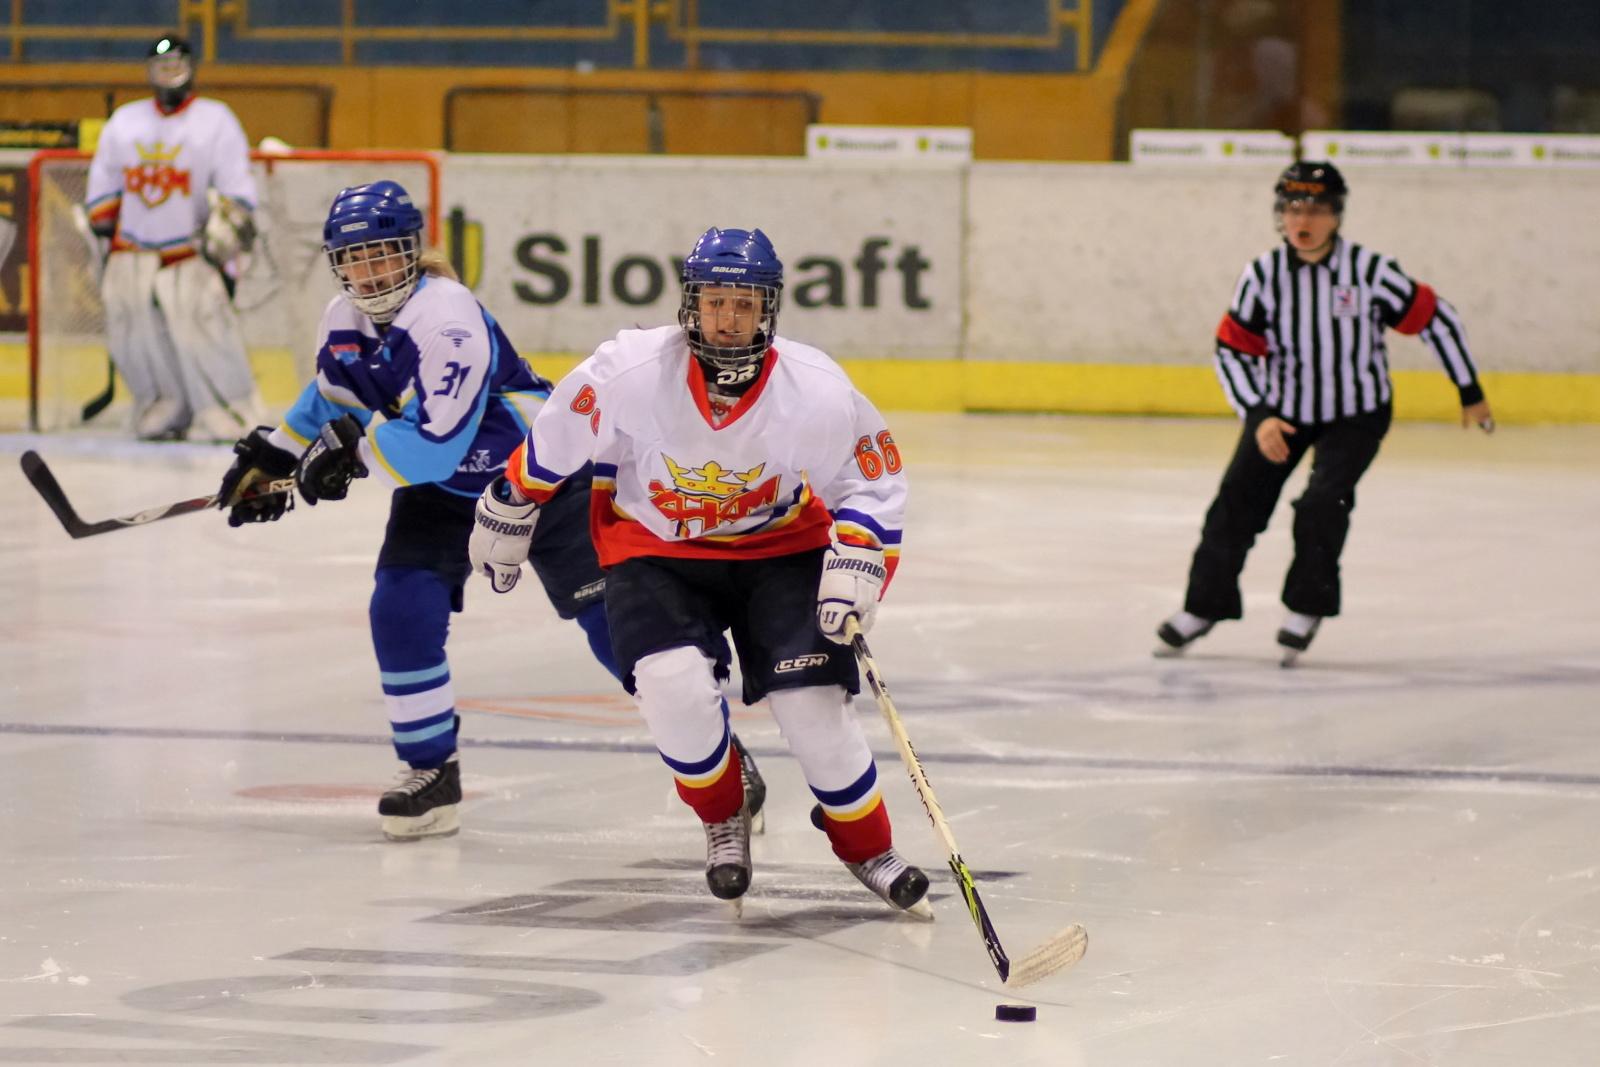 zhkm-zvolen-martin-hokej-2011-17